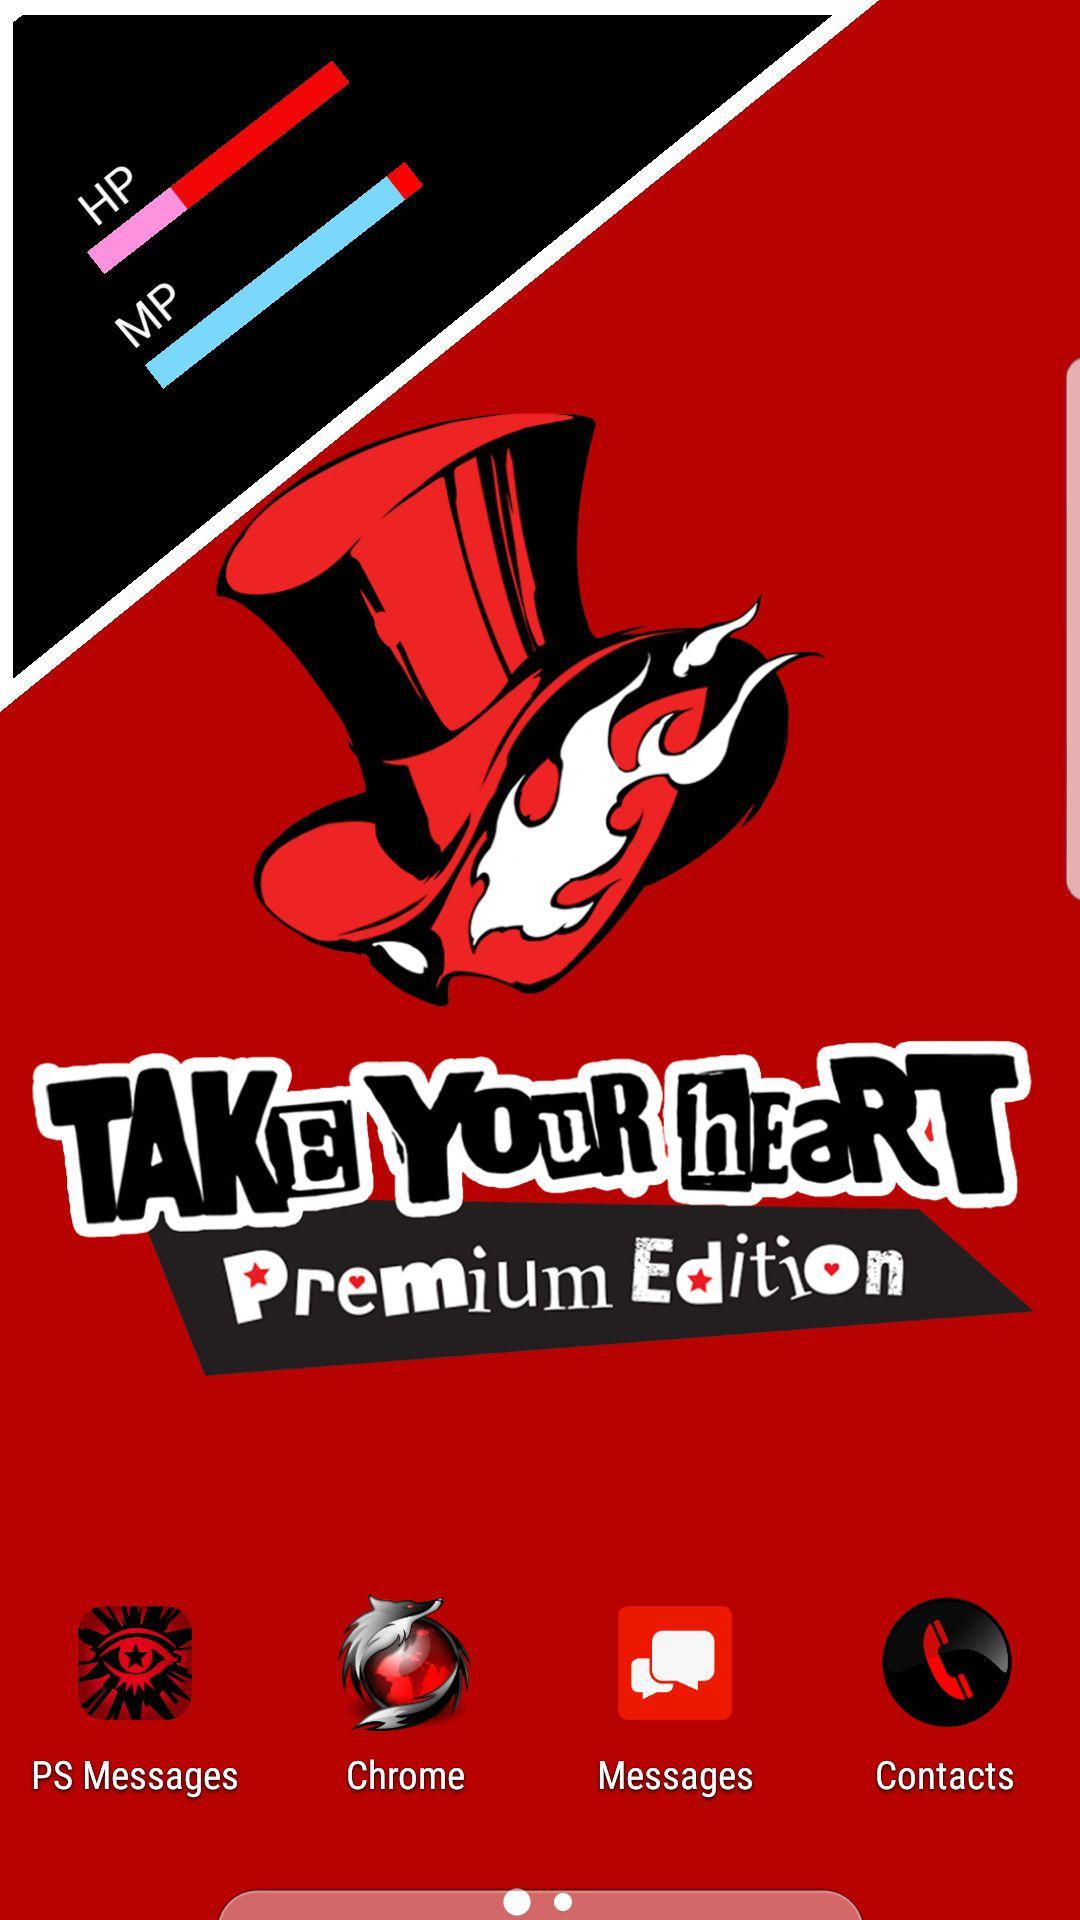 Persona 5 Take Your Heart Wallpaper In 2020 Heart Wallpaper